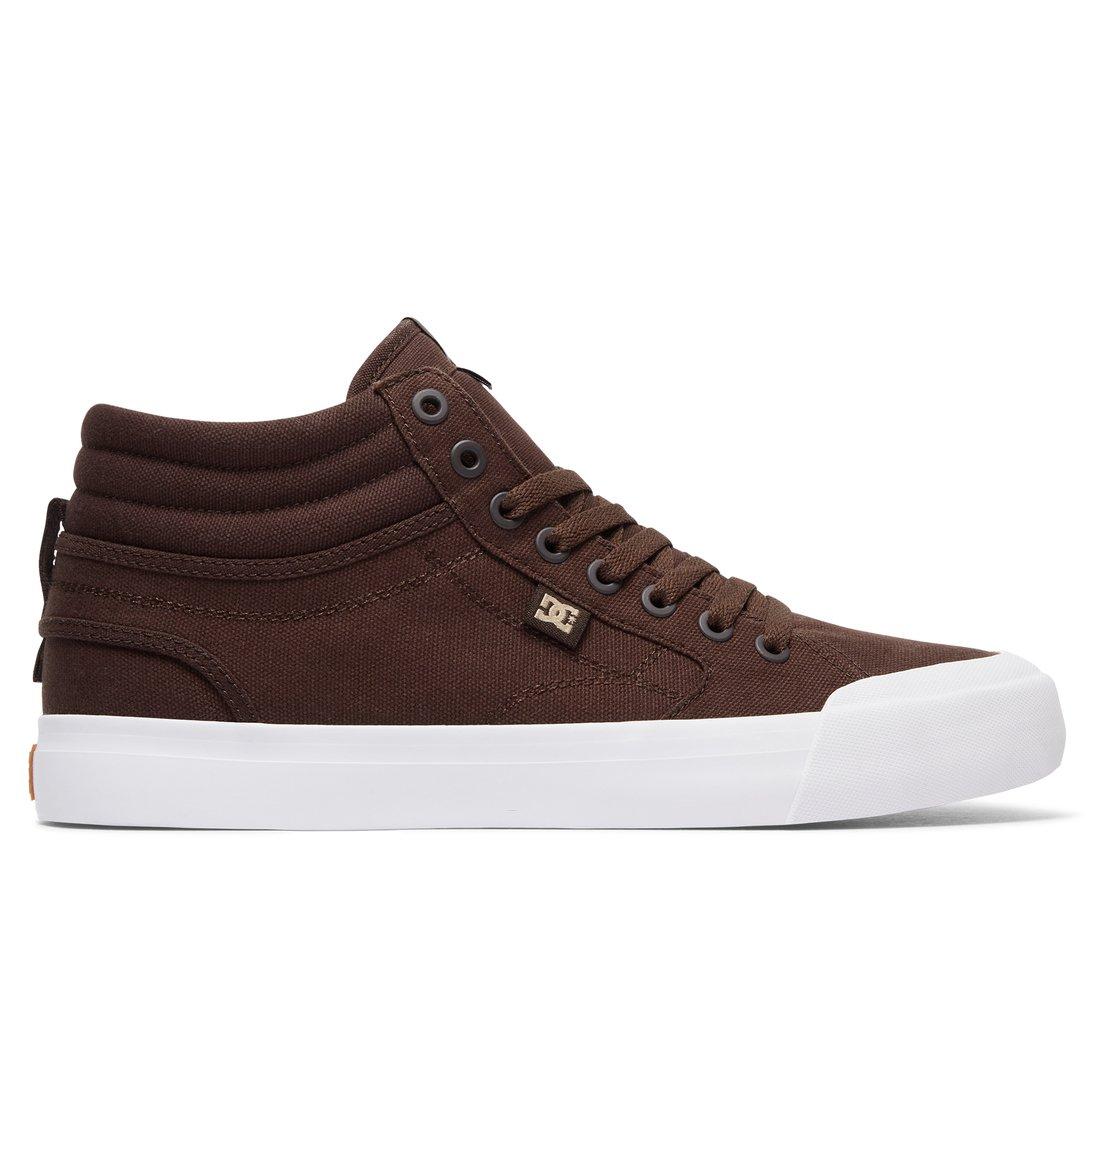 DC Shoes Evan Smith Hi Chaussure Homme Noir Taille 42.5